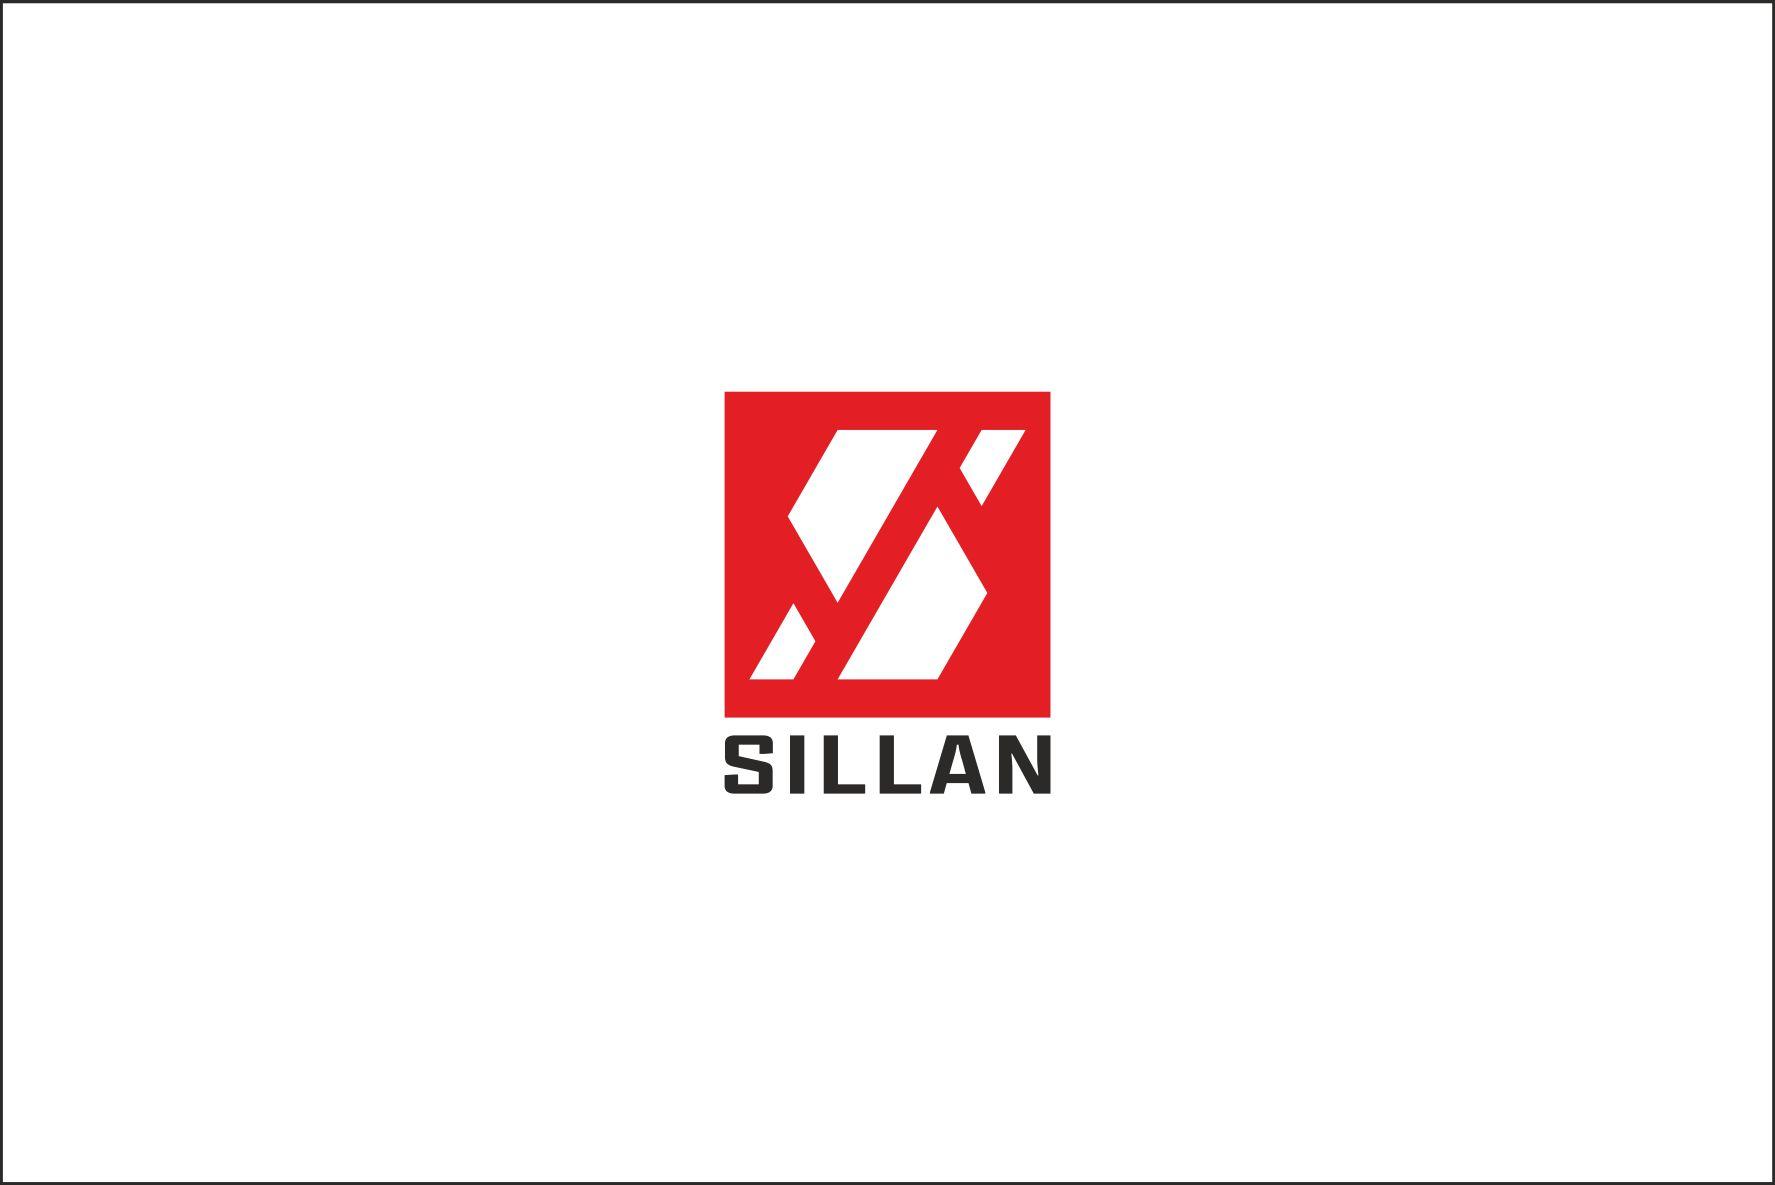 Логотип для Sillan - дизайнер erkin84m